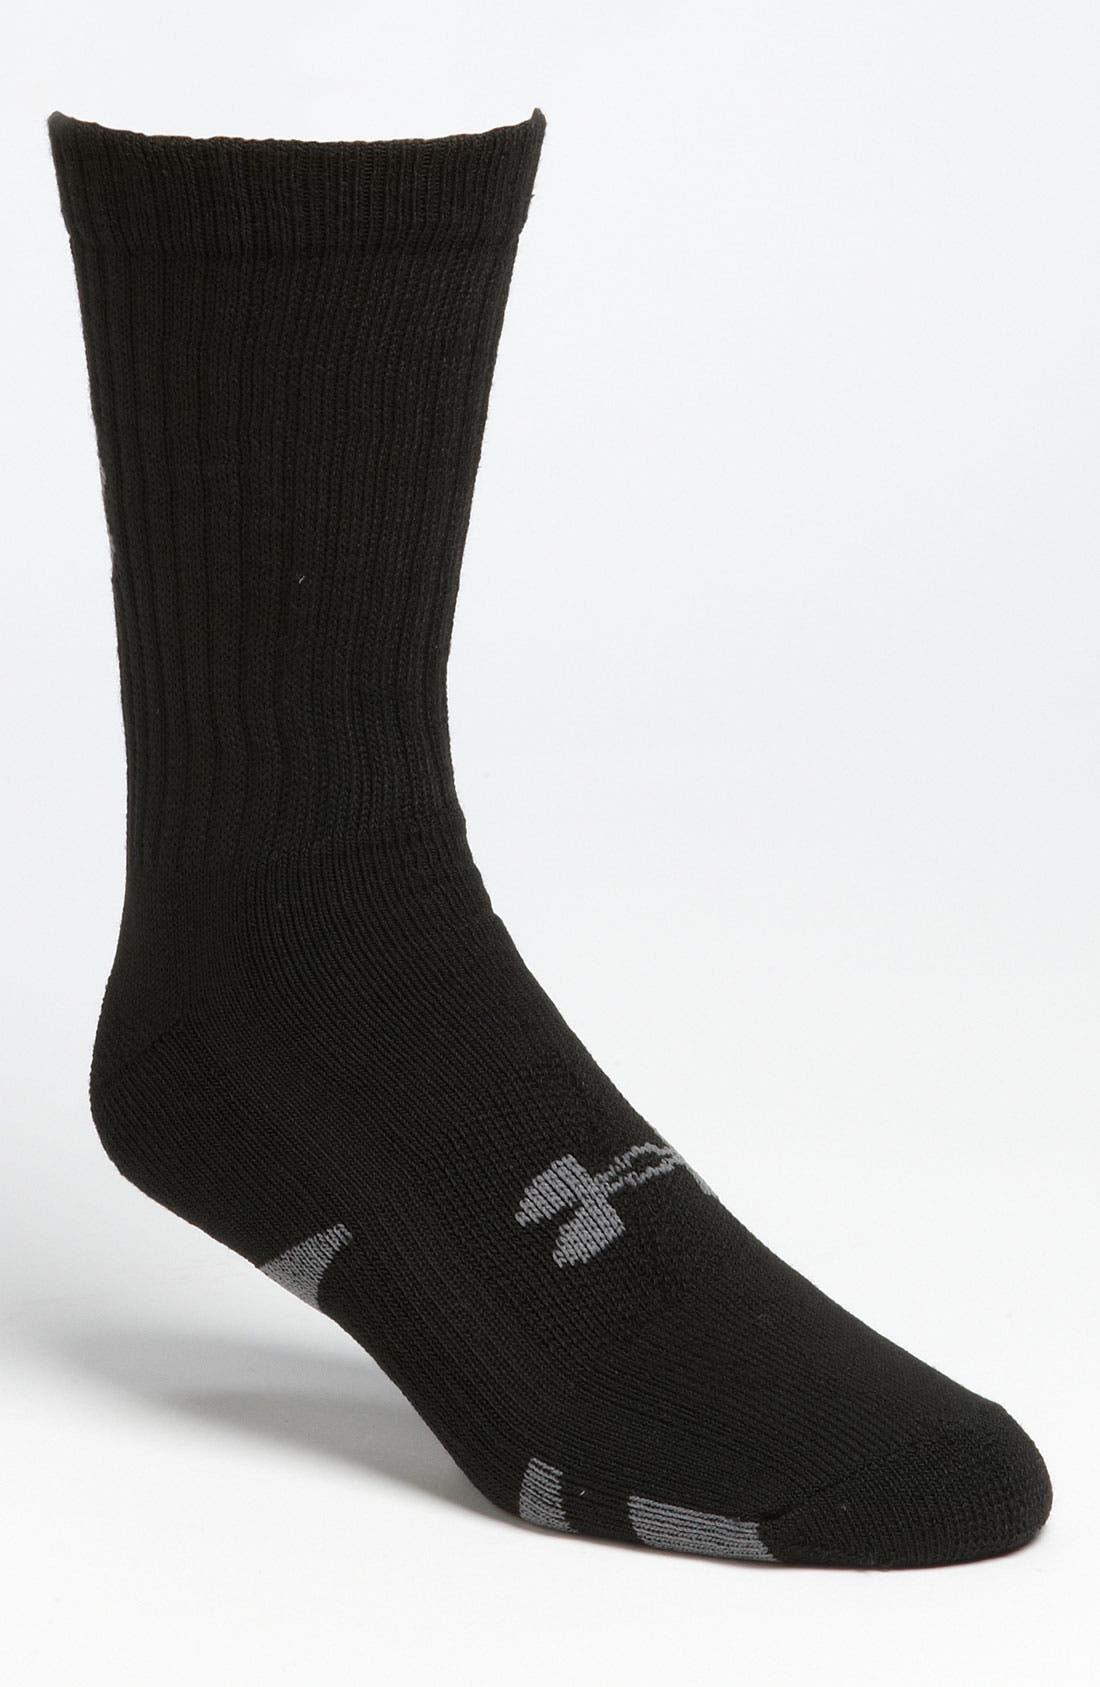 Alternate Image 1 Selected - Under Armour HeatGear® Crew Socks (4-Pack)